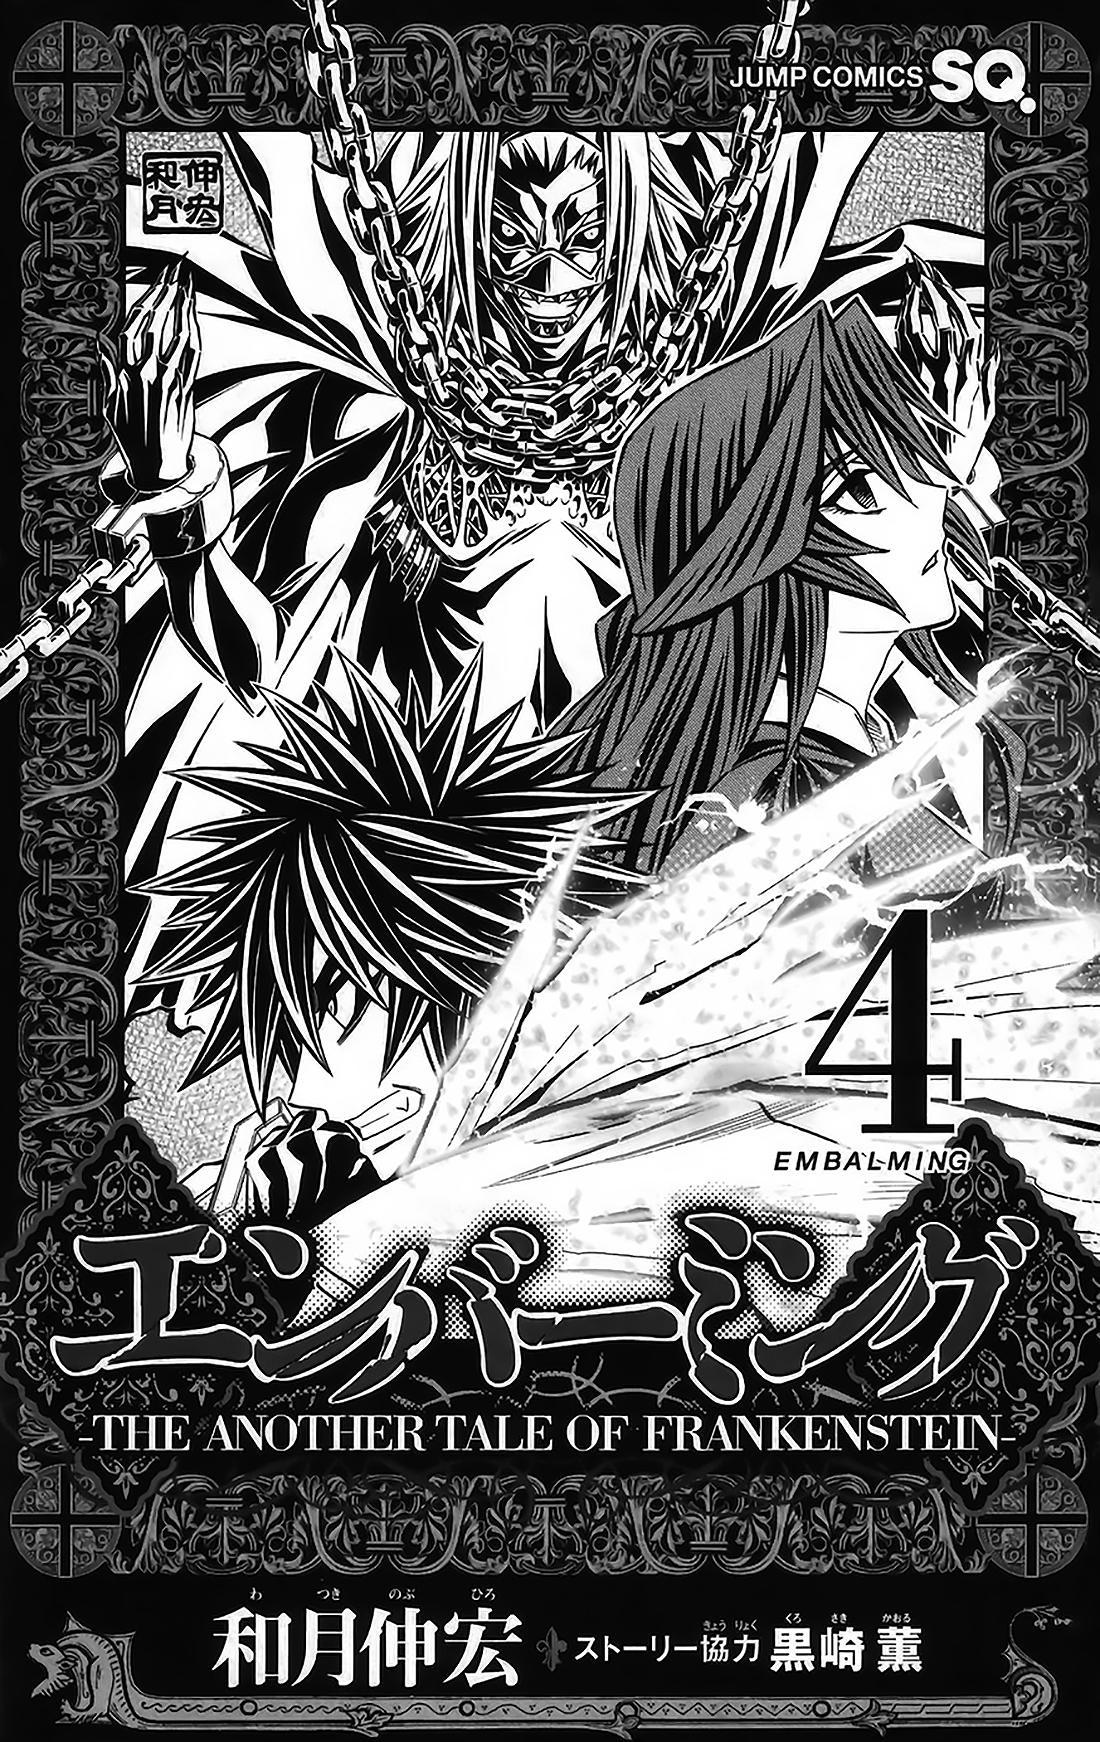 http://c5.ninemanga.com/es_manga/45/18797/447909/325e58f8c73d5792e2a873d288e485cc.jpg Page 5